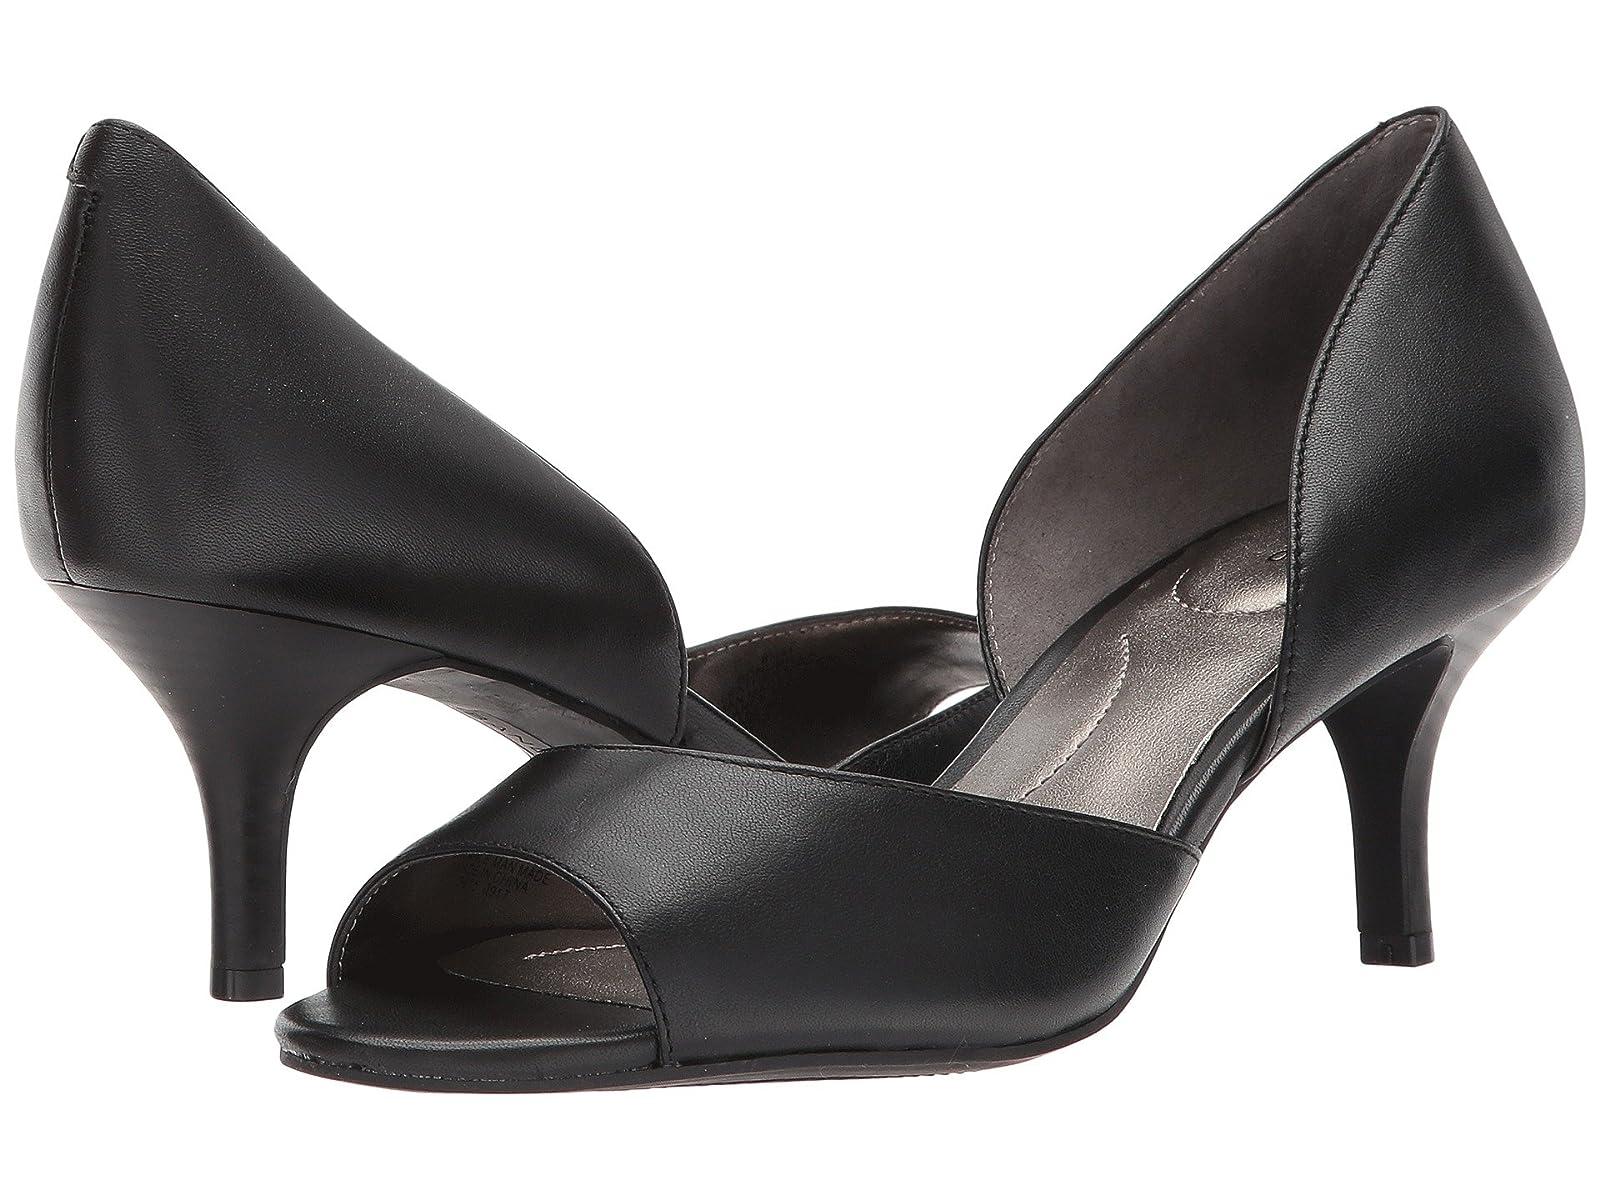 Bandolino NubillaCheap and distinctive eye-catching shoes